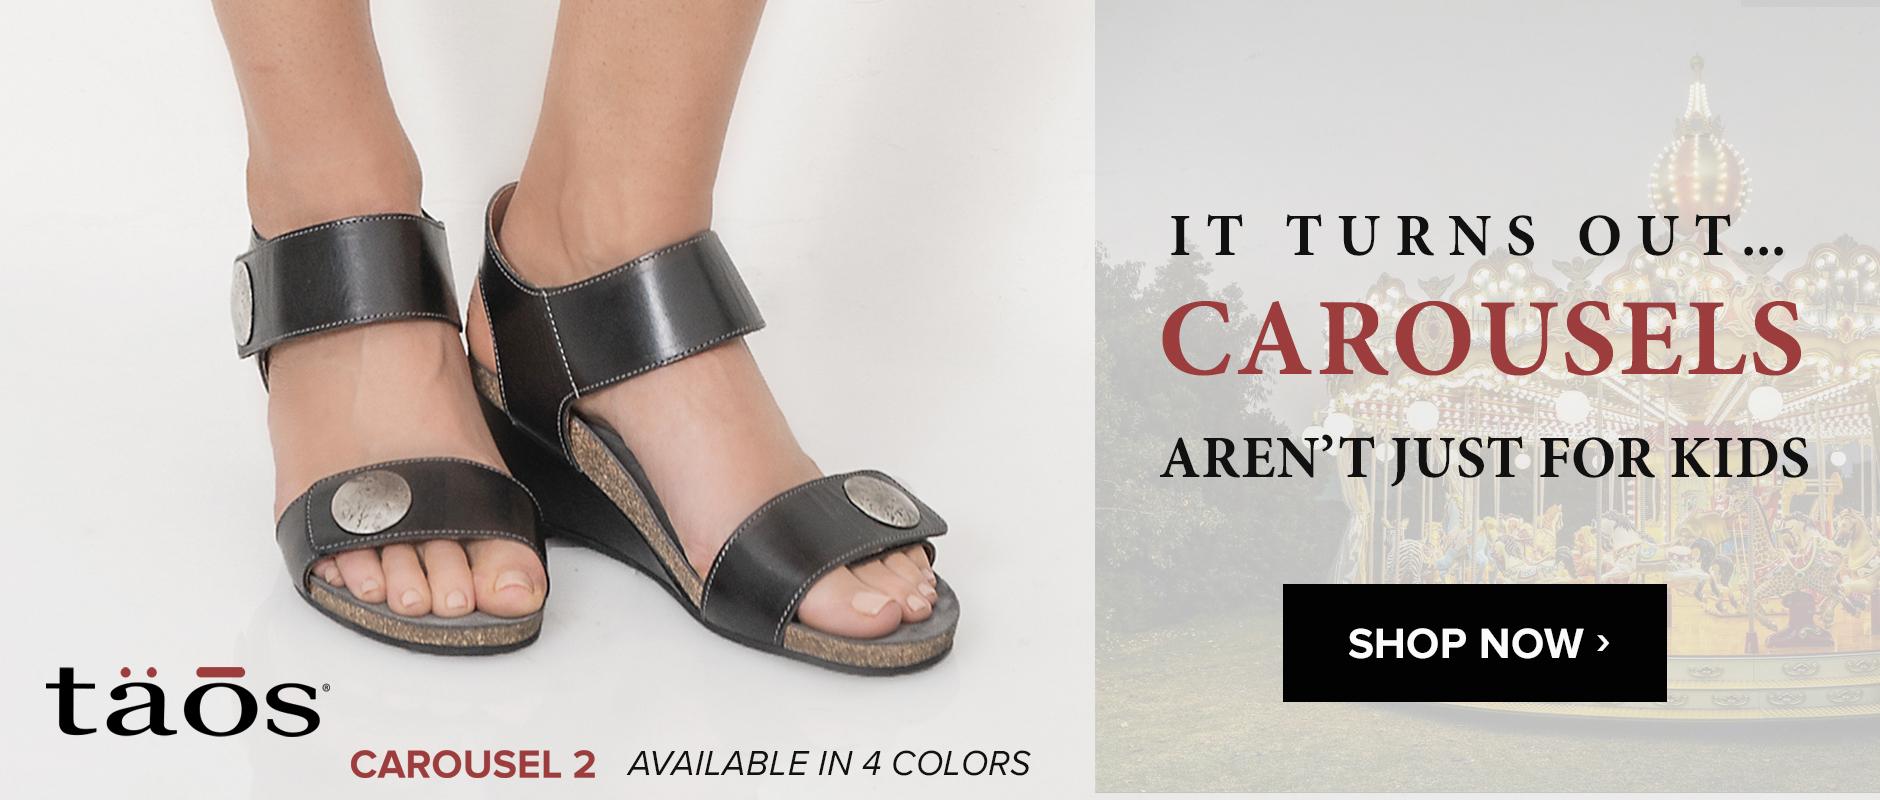 Taos Carousel Sandals